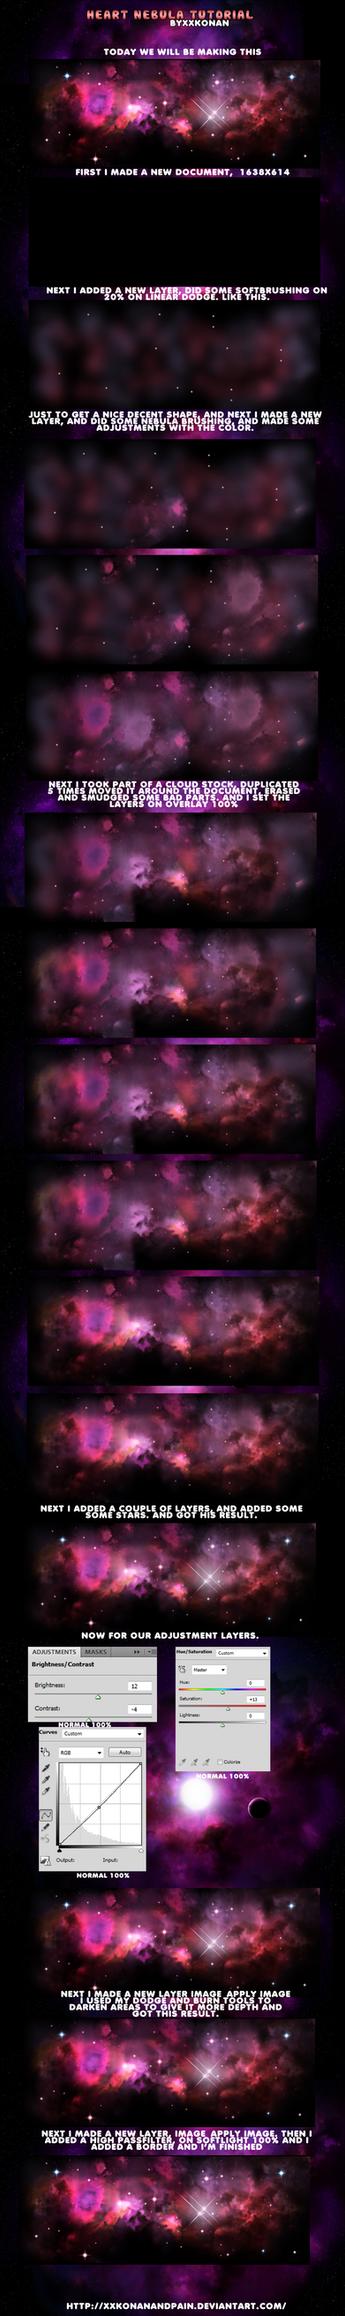 Heart of the Nebula Tutorial by xXKonanandPain